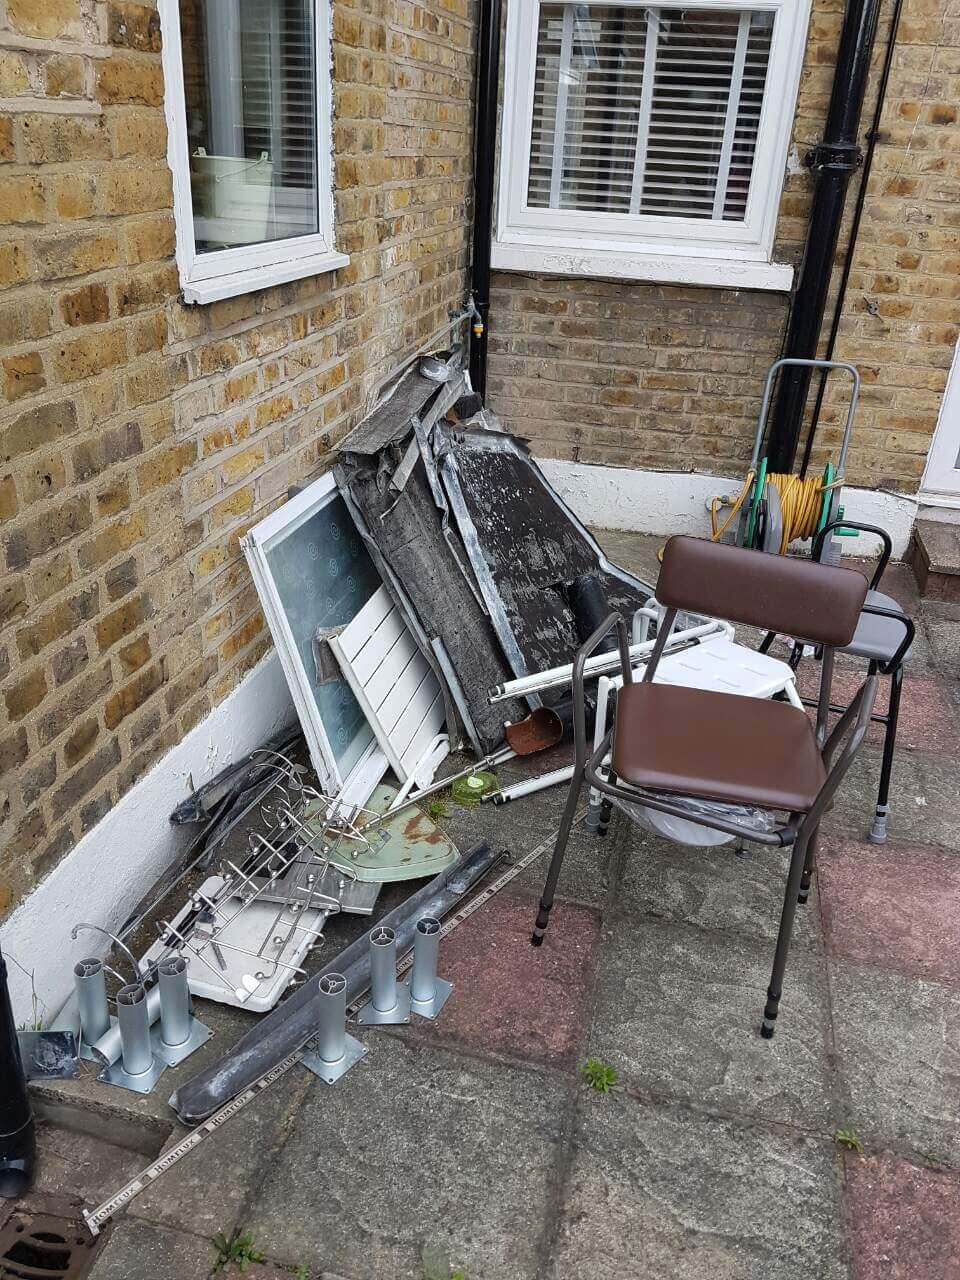 Rubbish Clearance in Brixton